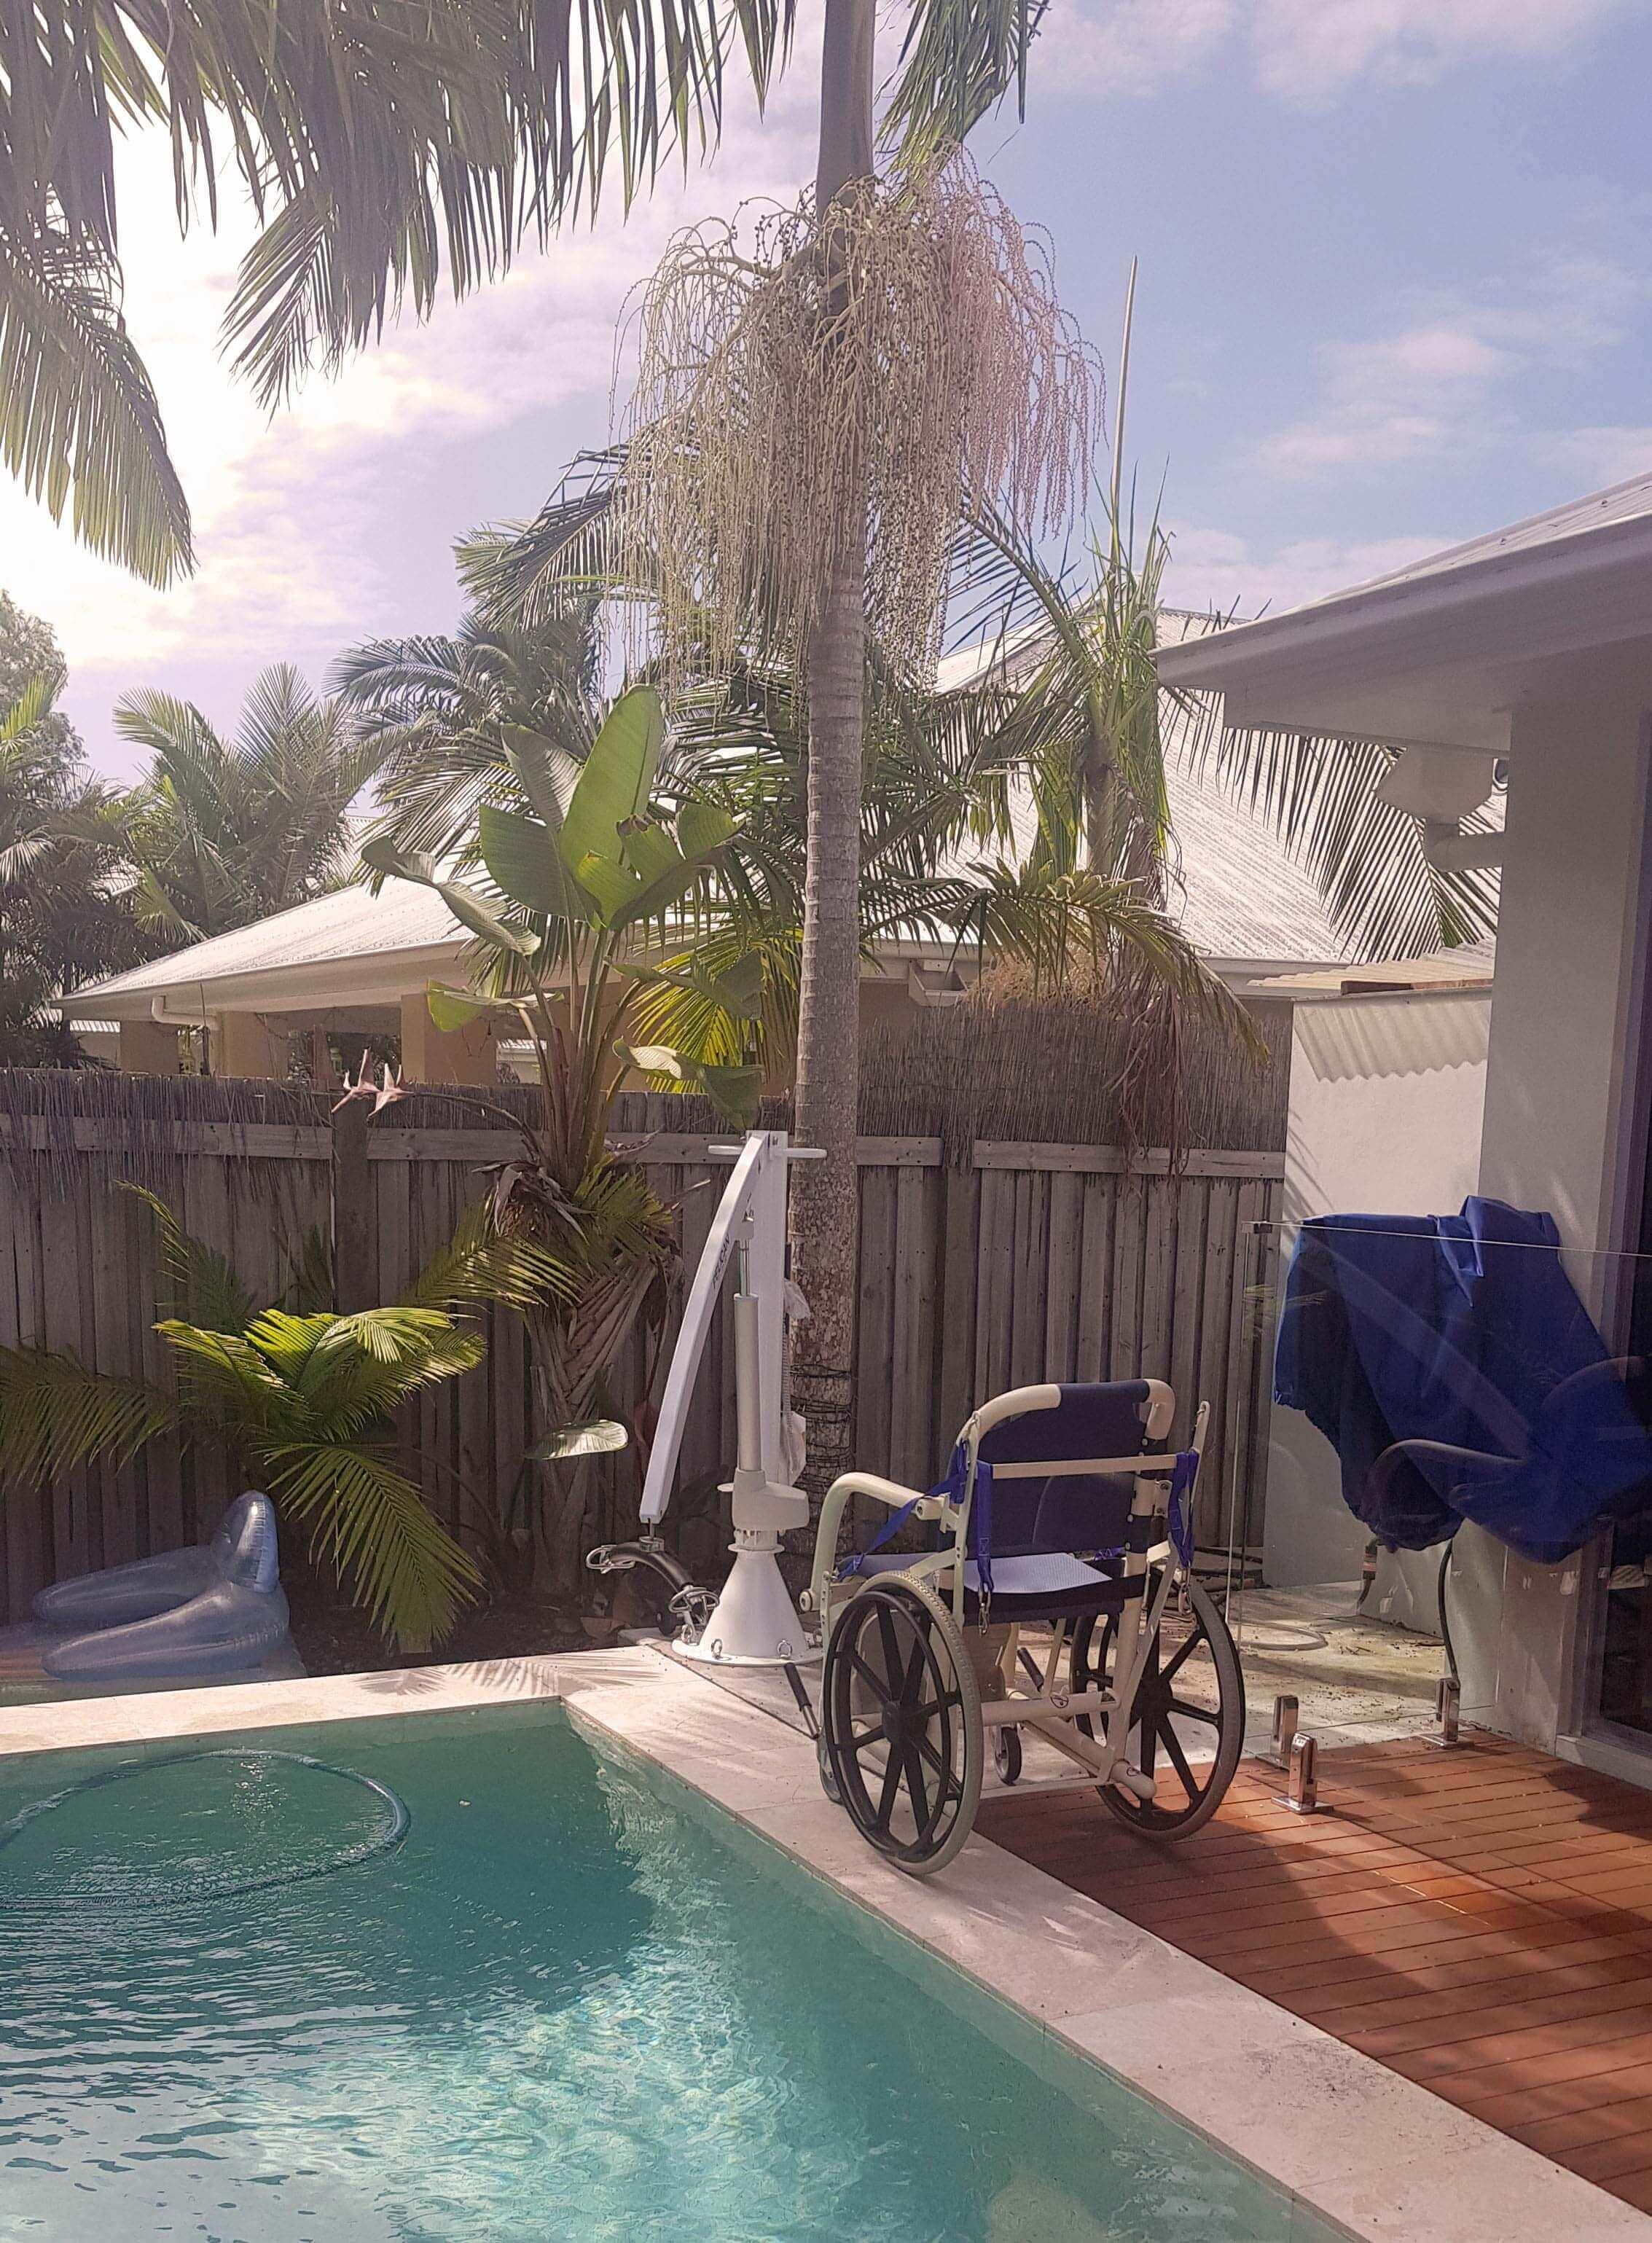 Wheel chair beside wheel chair lift into pool in sunny garden